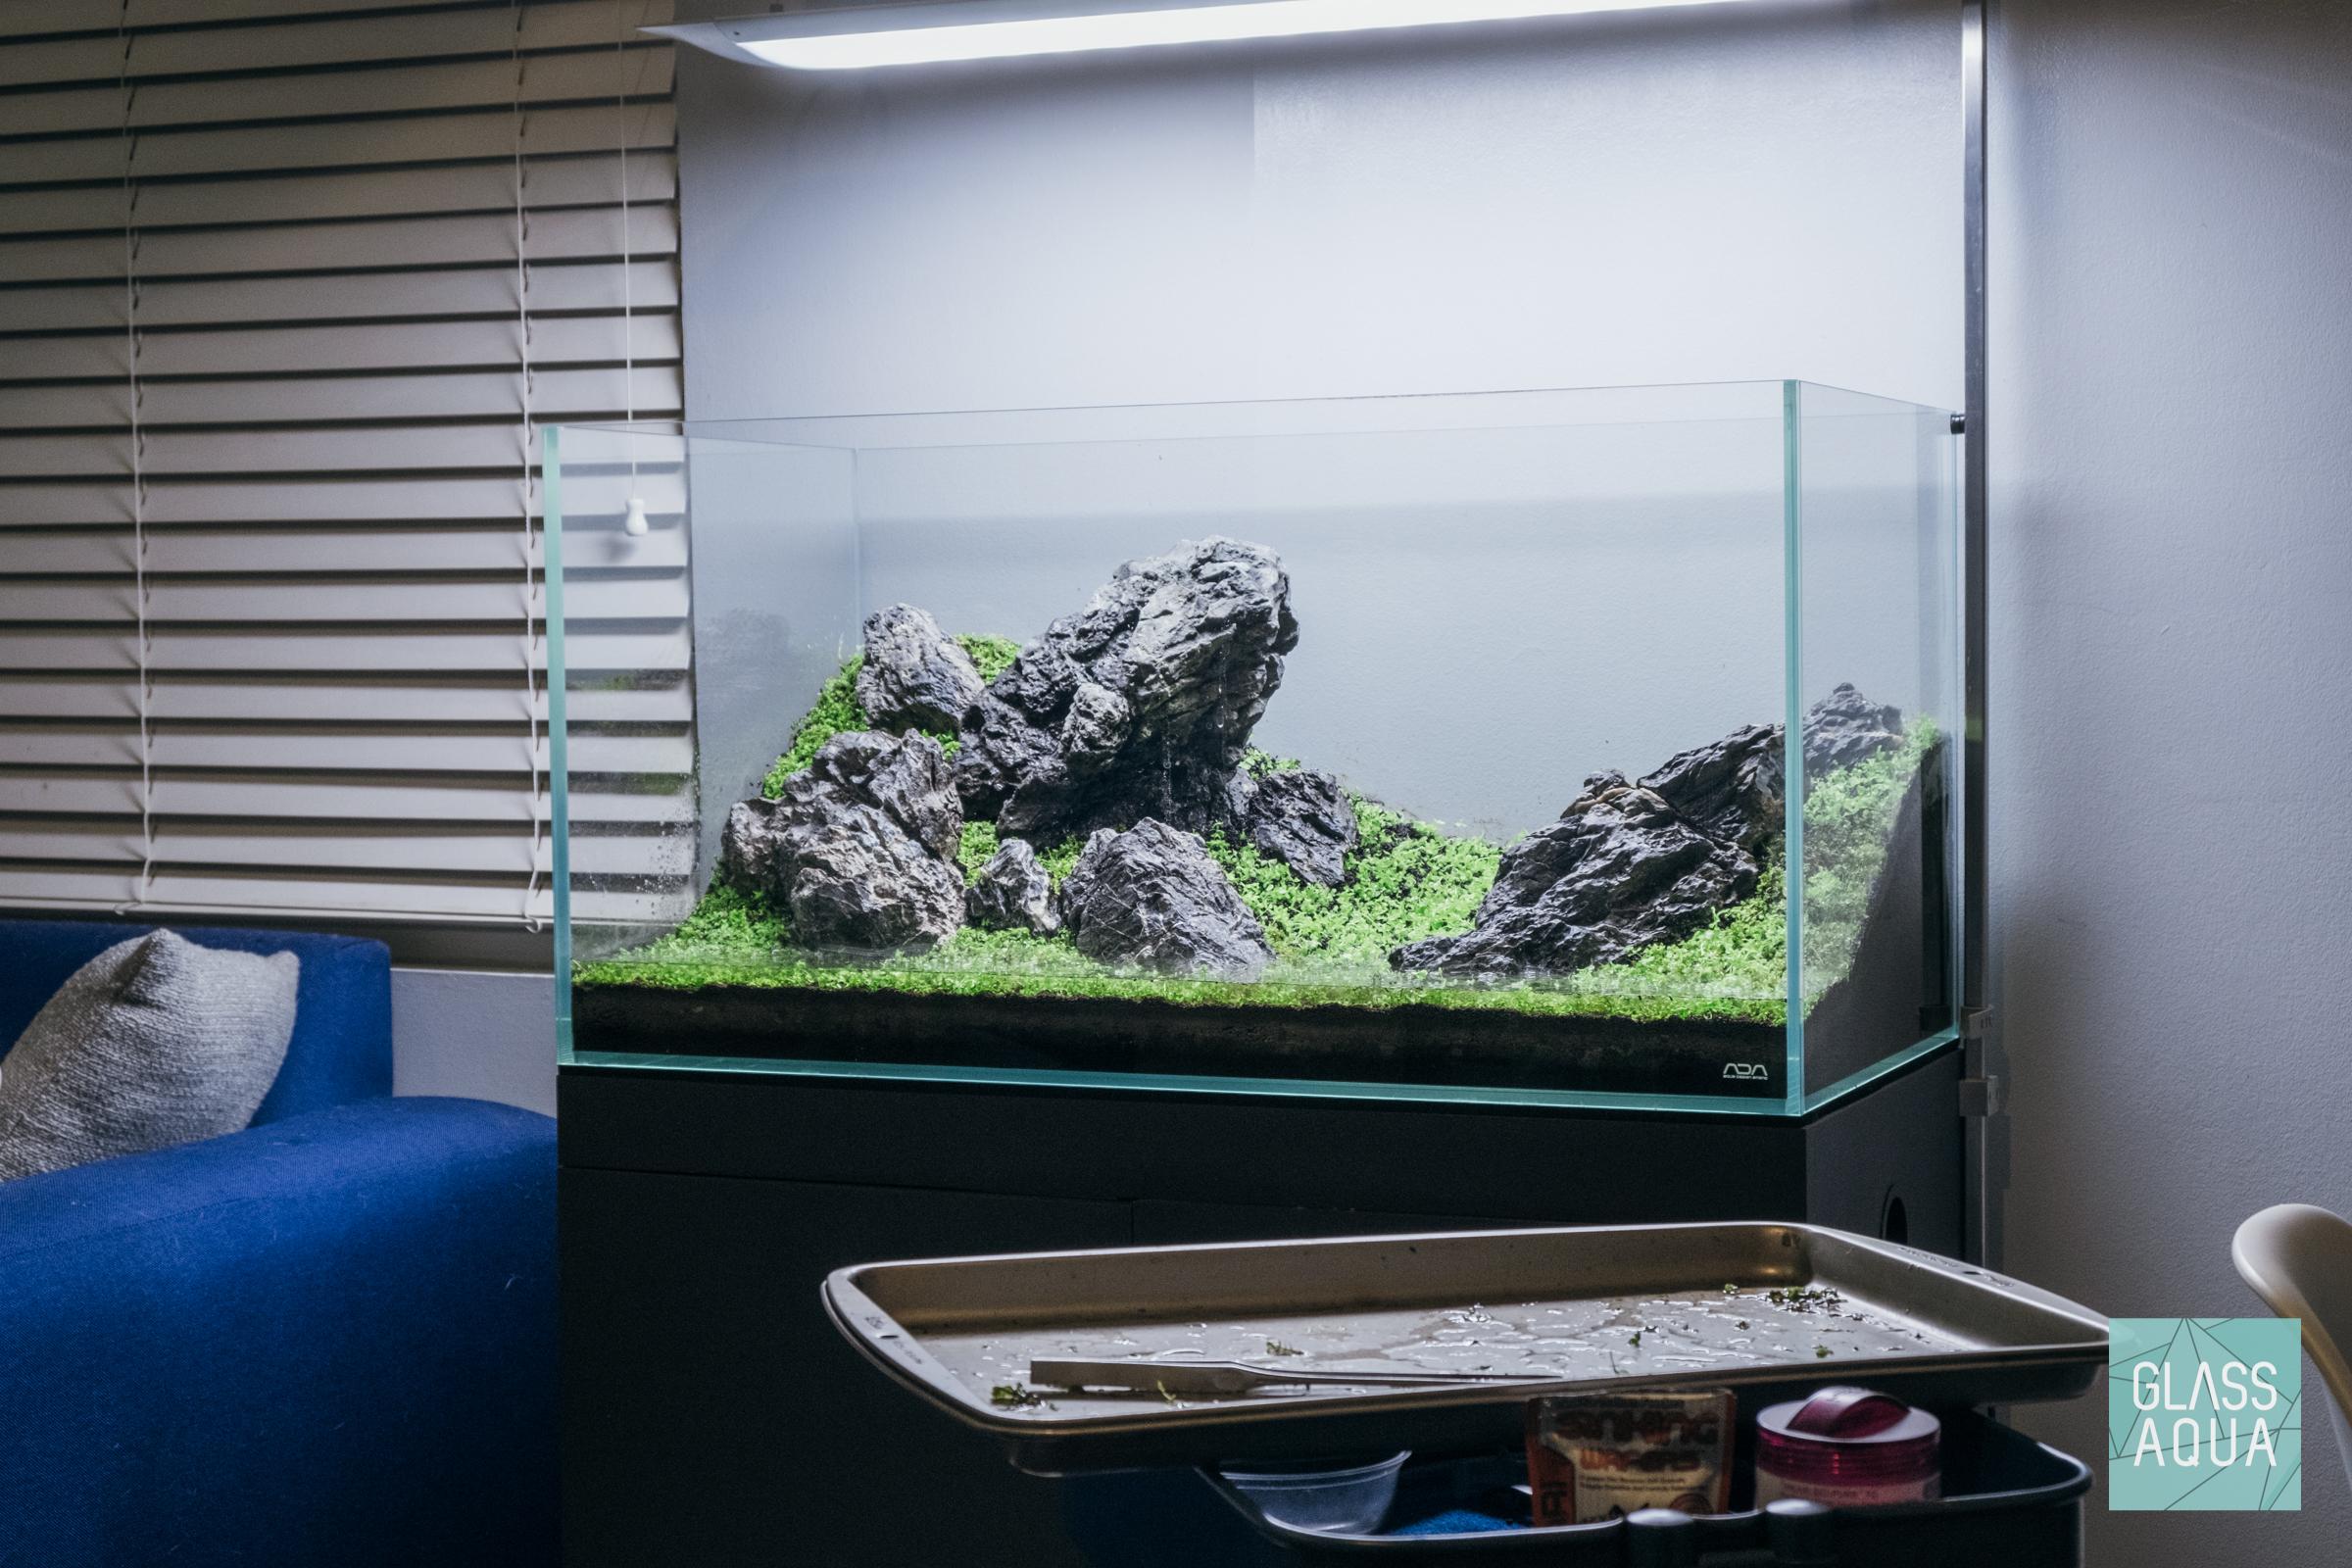 Ada Iwagumi Ryuoh Stone Aquascape Planted Aquarium Tank Glass Aqua